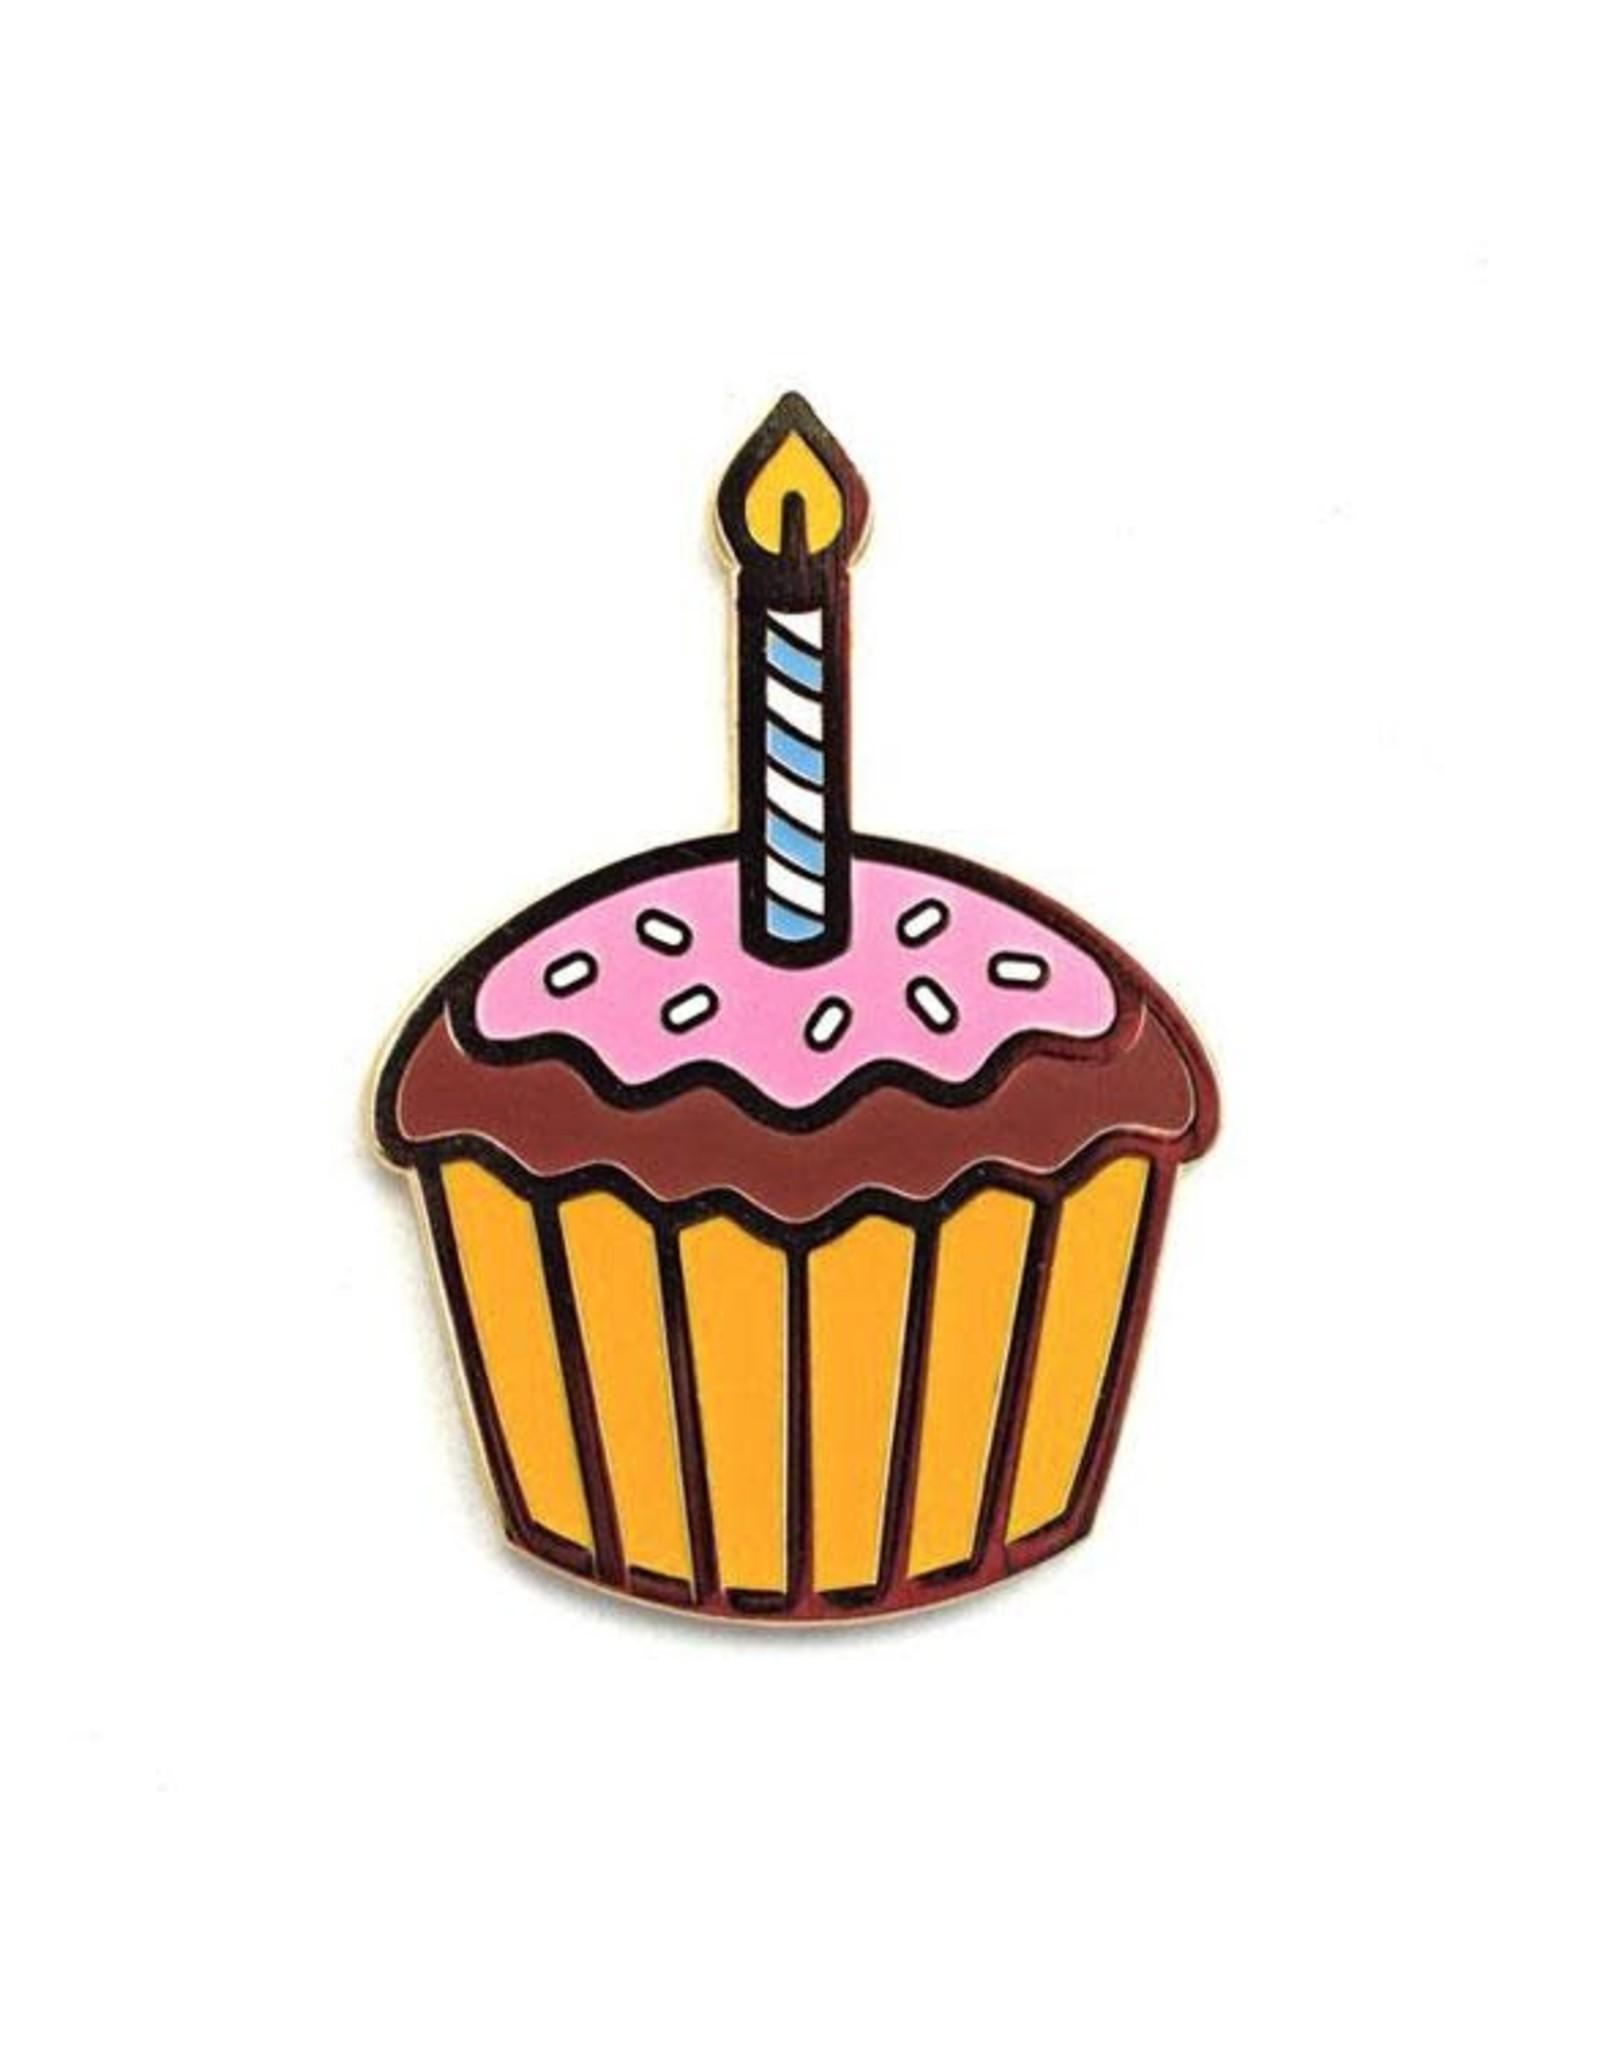 Valley Cruise Press Birthday Cupcake Greeting Card + Enamel Pin - Valley Cruise Press